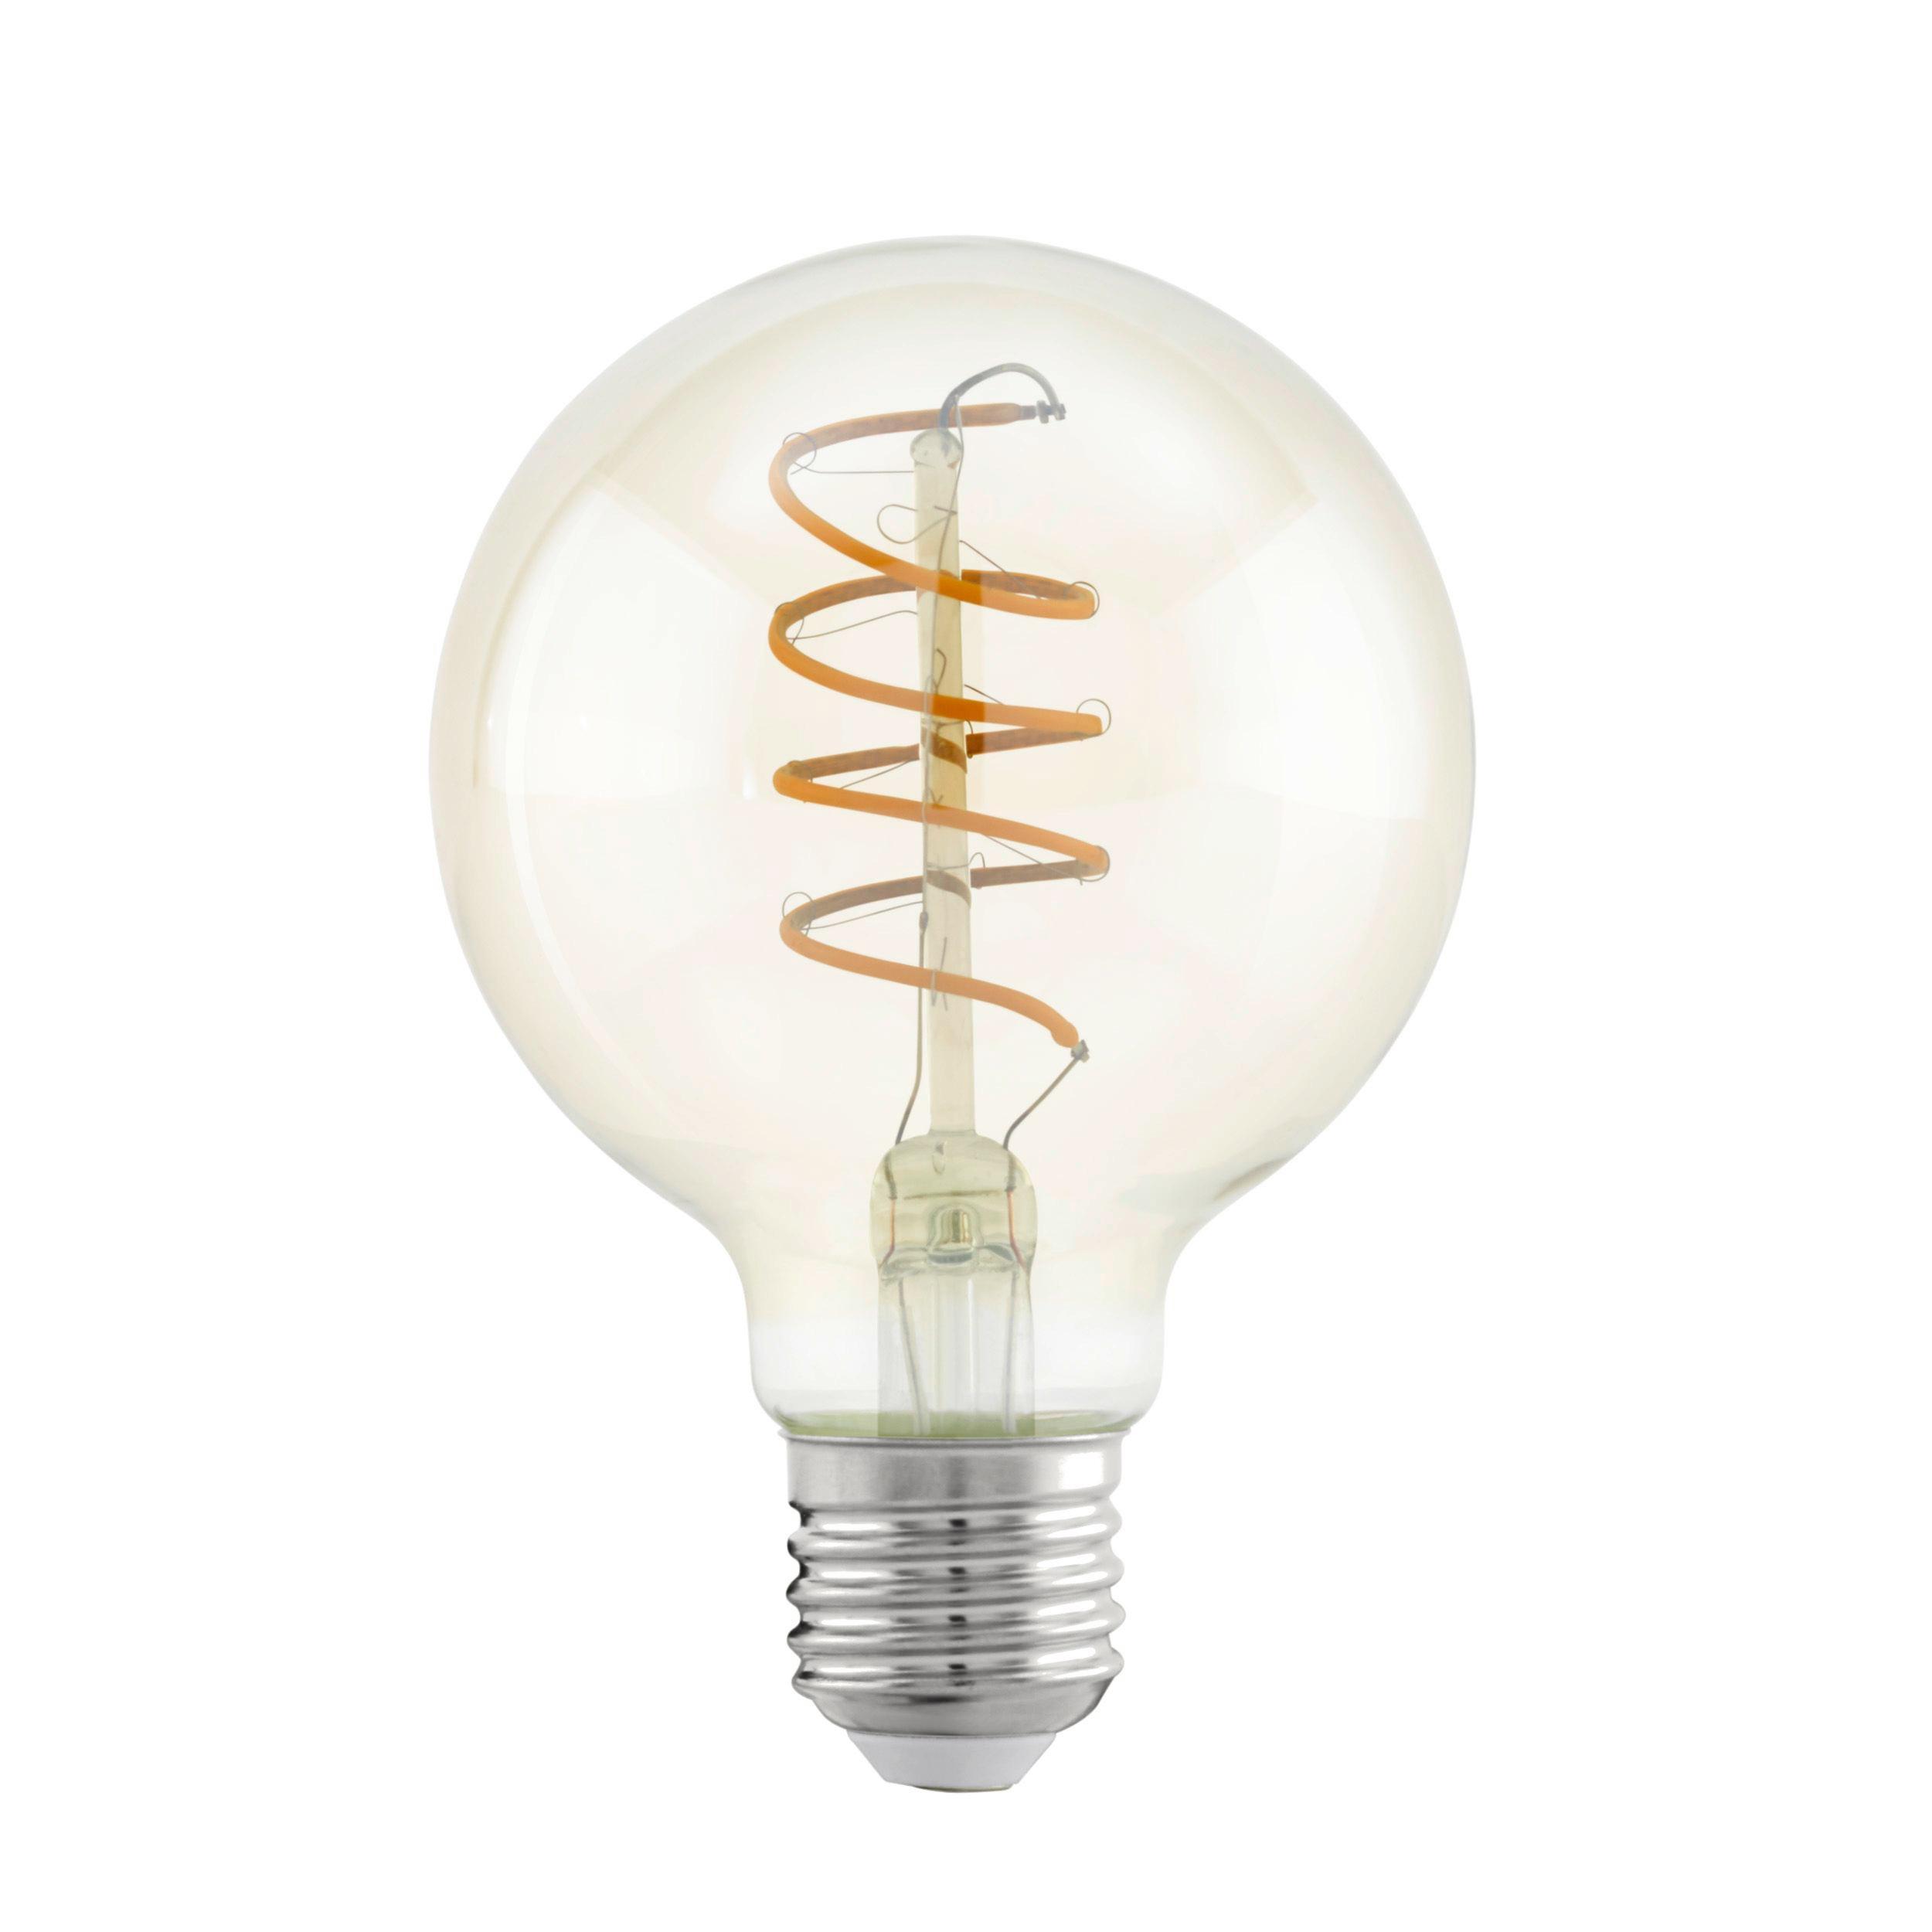 LED Leuchtmittel 11722 warmweiß Amber Globe Spiral